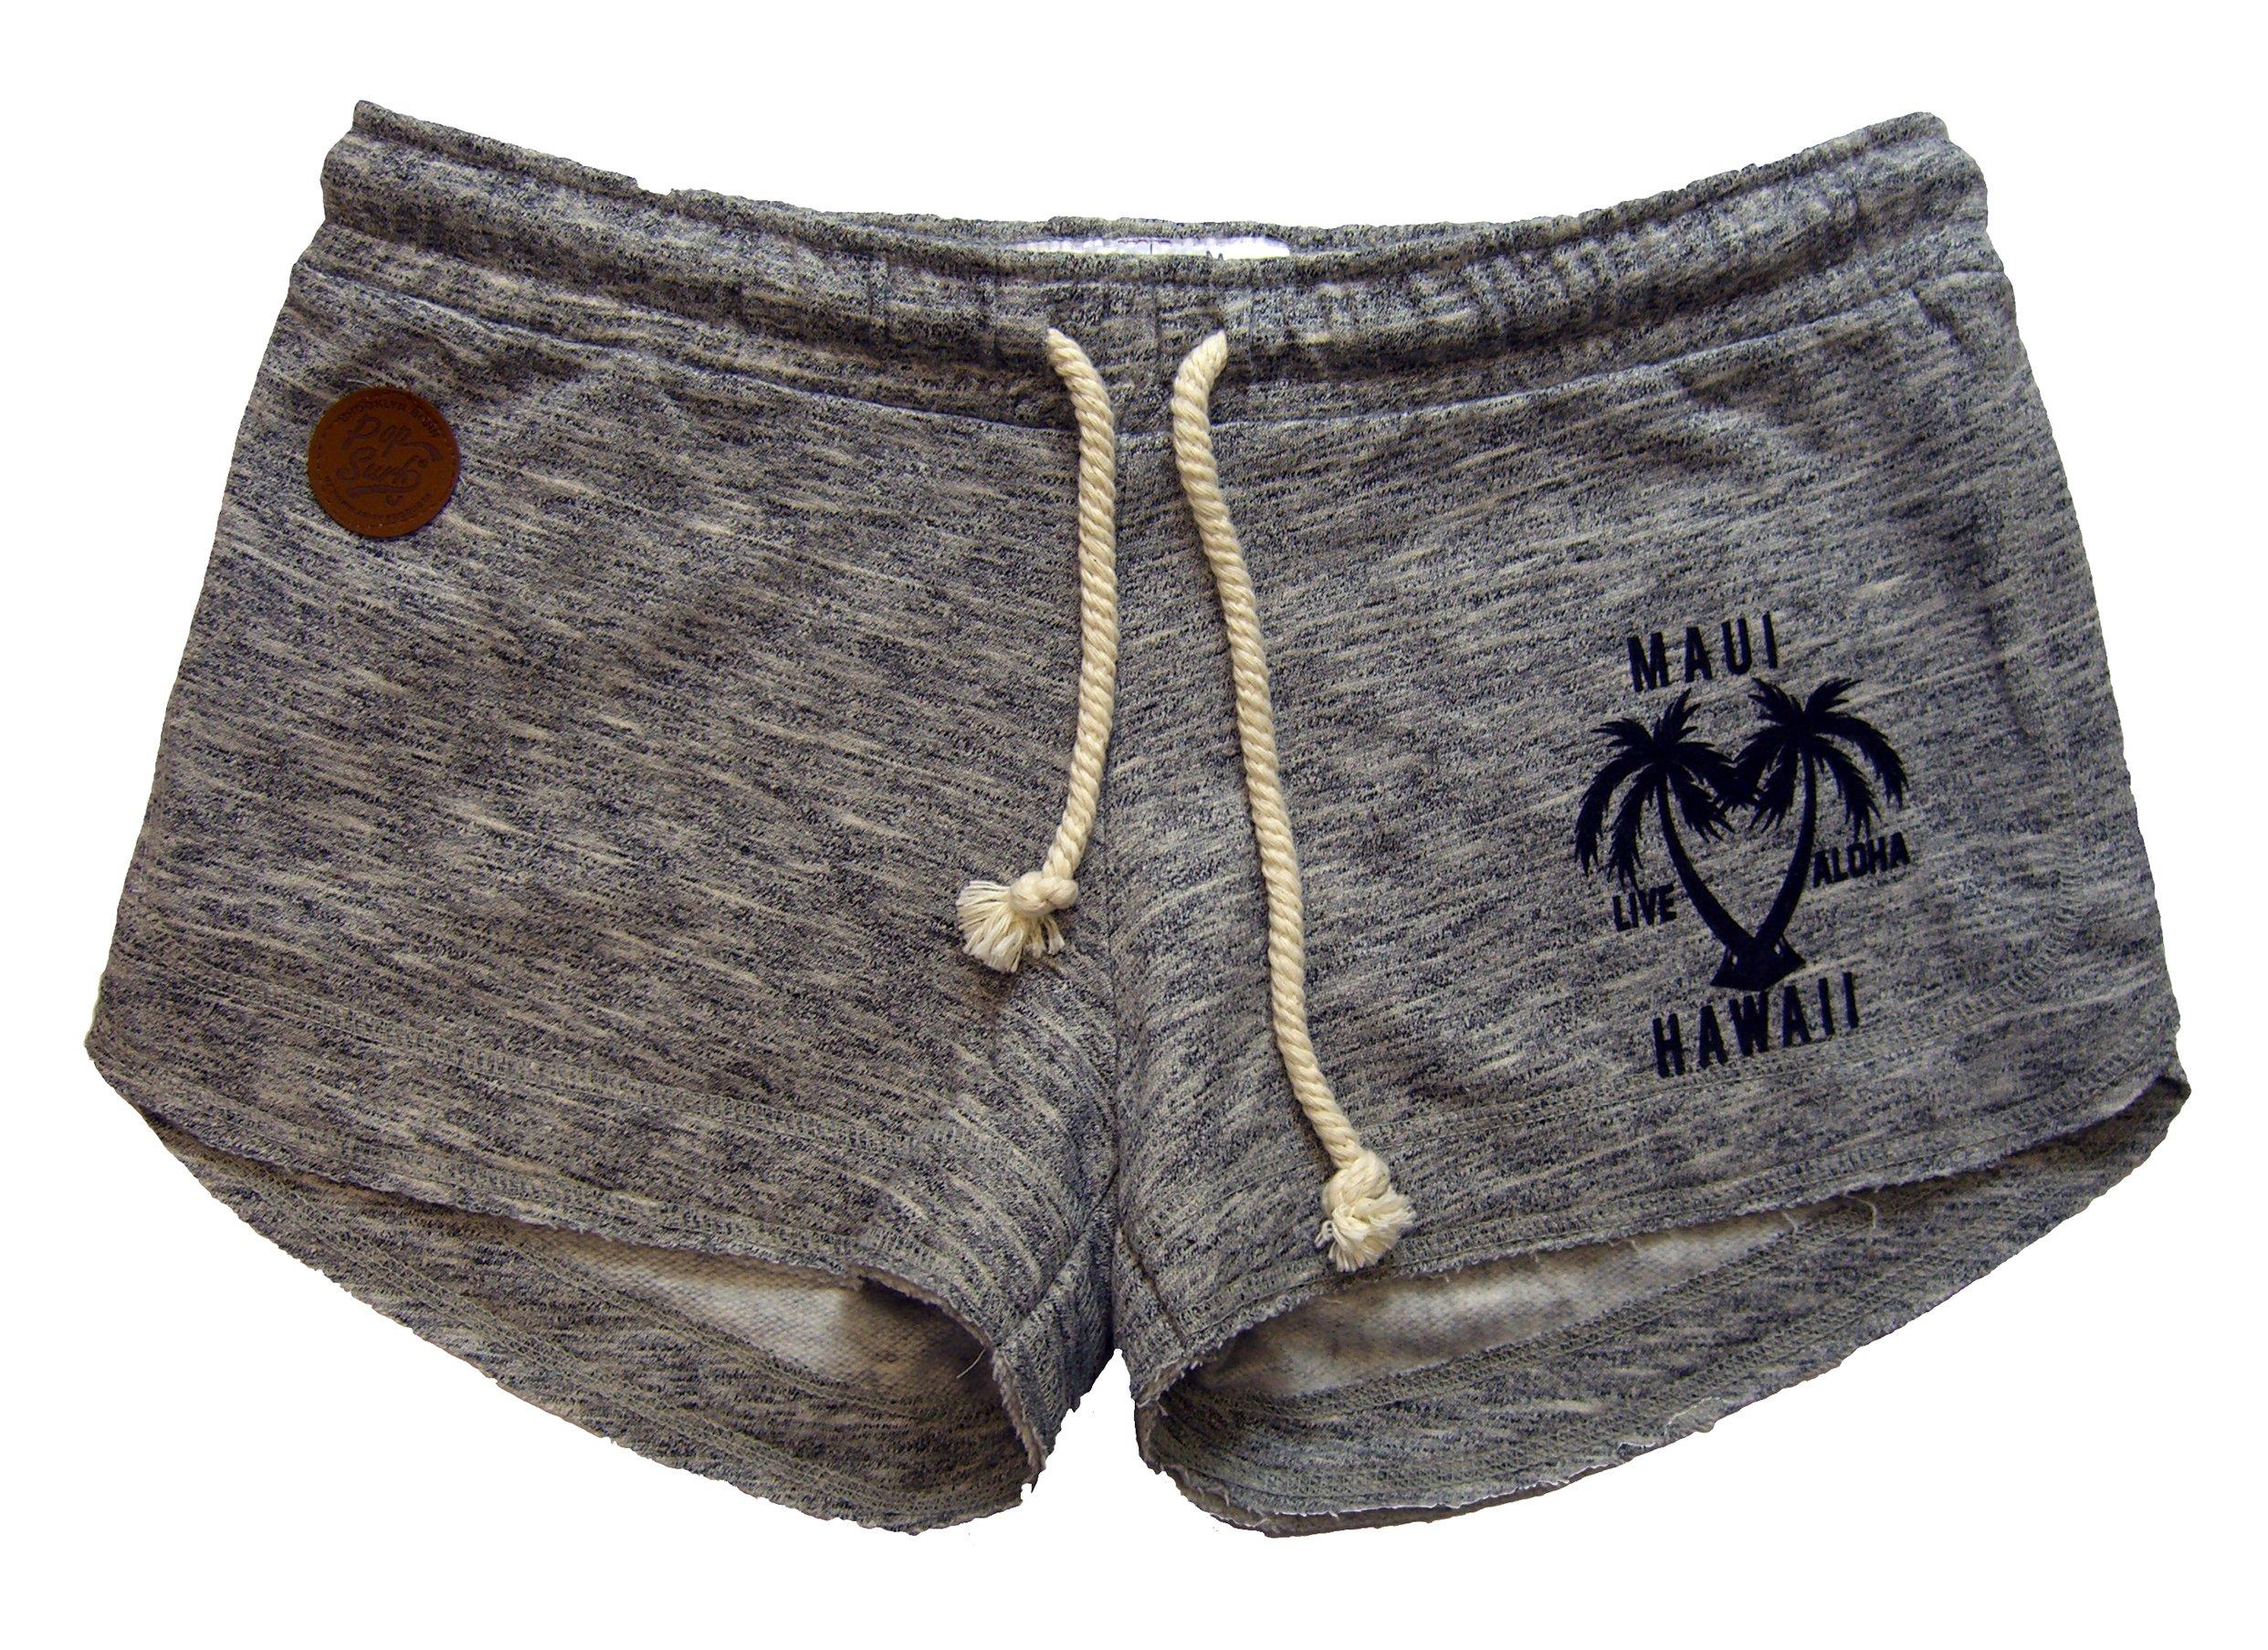 Maui Clothing Hawaii Palm Heart Melange Elastic Drawstring Shorts (Medium)